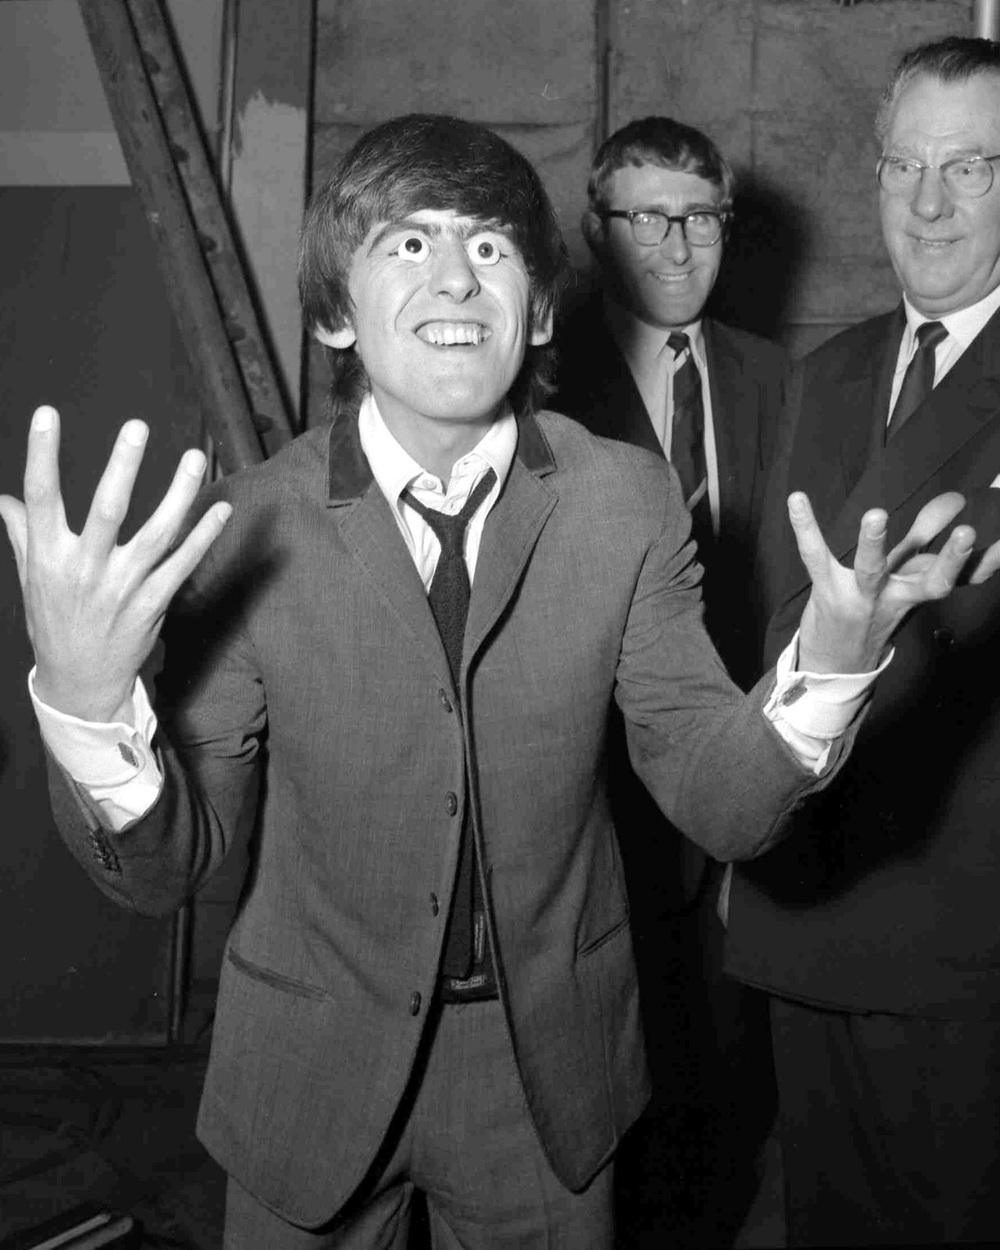 George Harrison  at Madame Tussauds, London, April 1964.